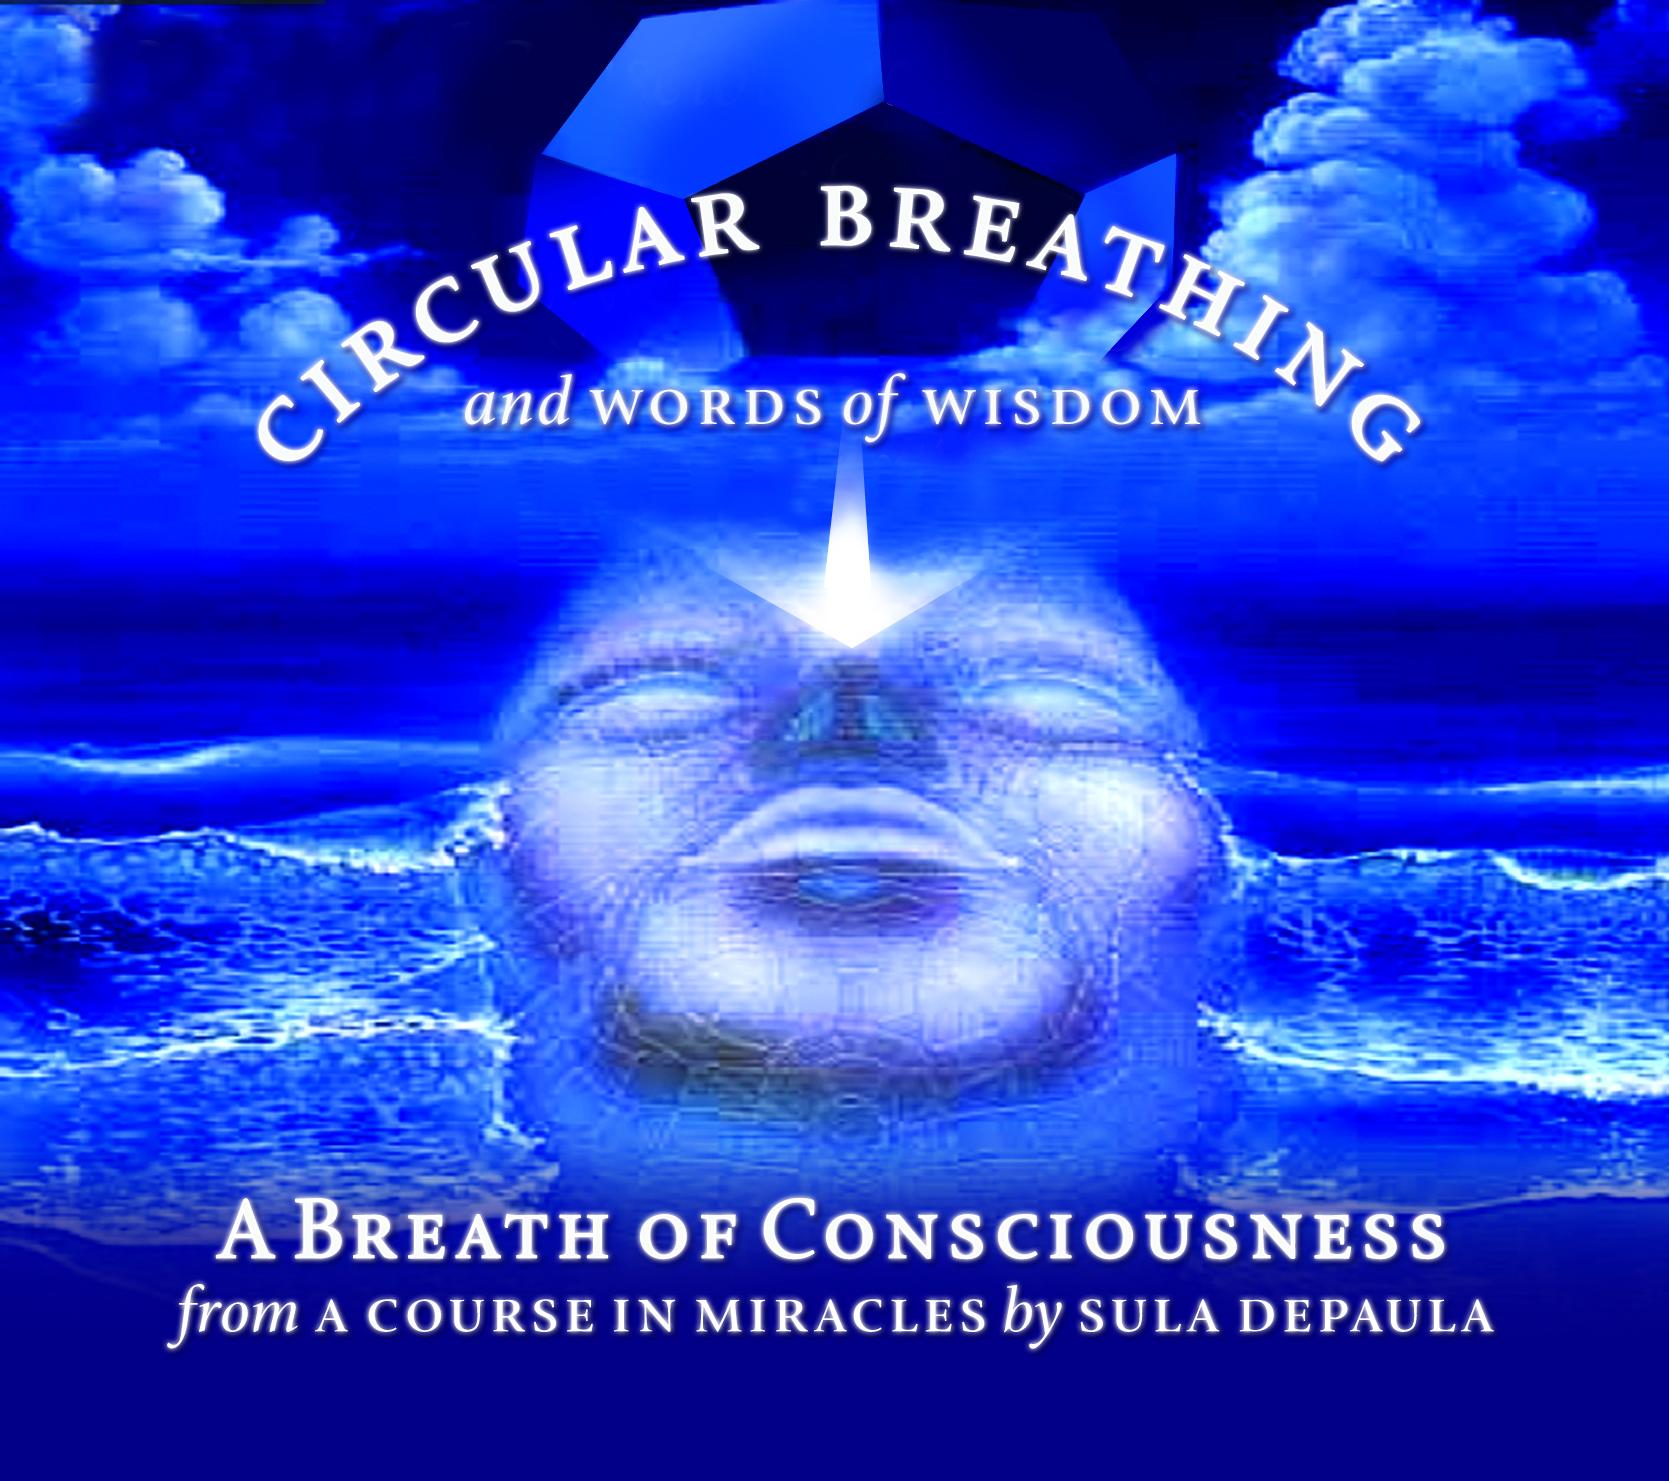 handbook to higher consciousness quotes